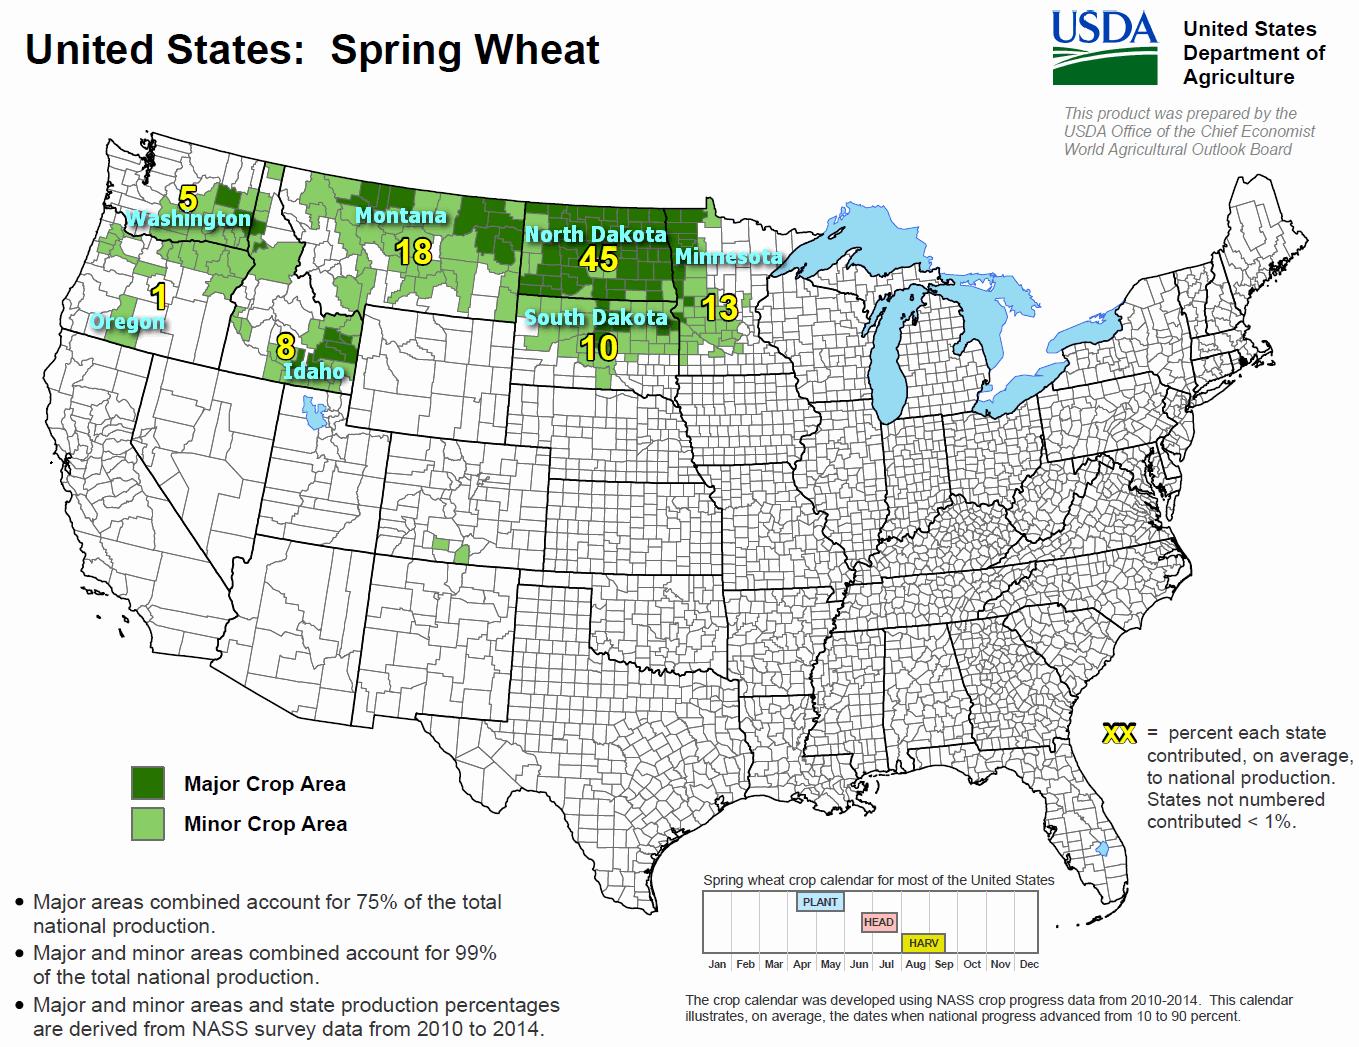 U.S. Spring Wheat Crop Map.png